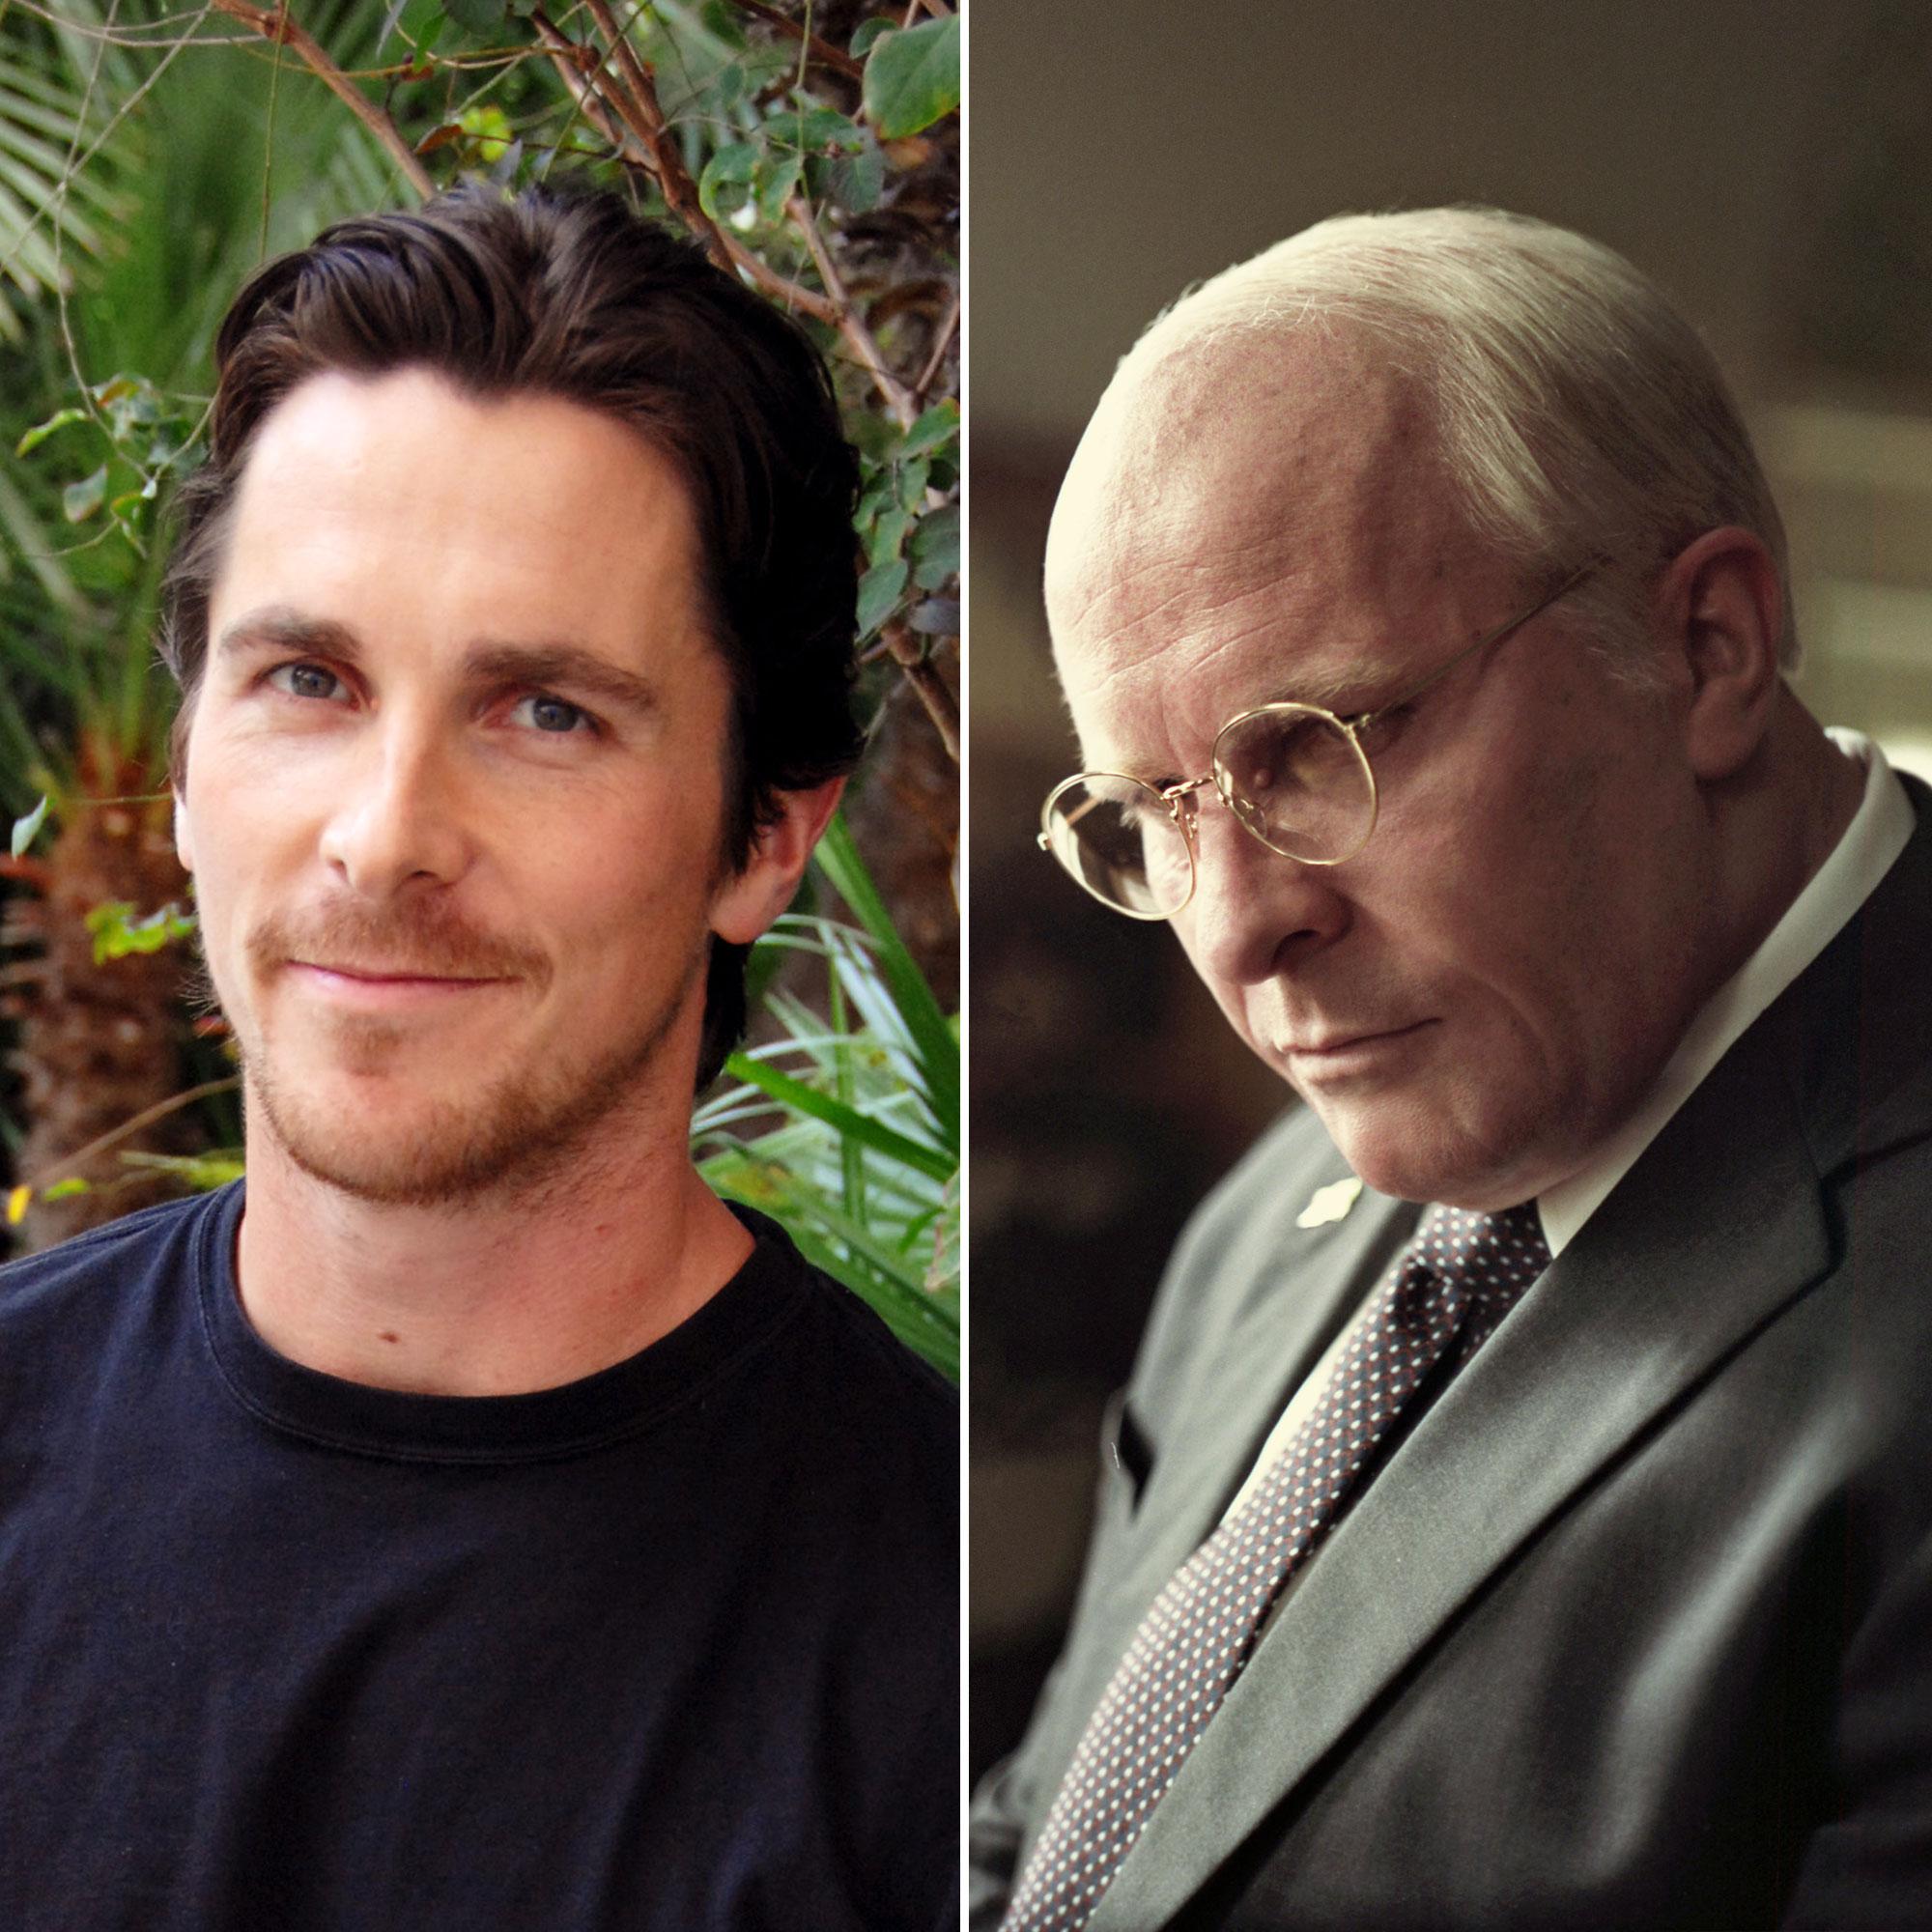 Watch Christian Bale (born 1974) video